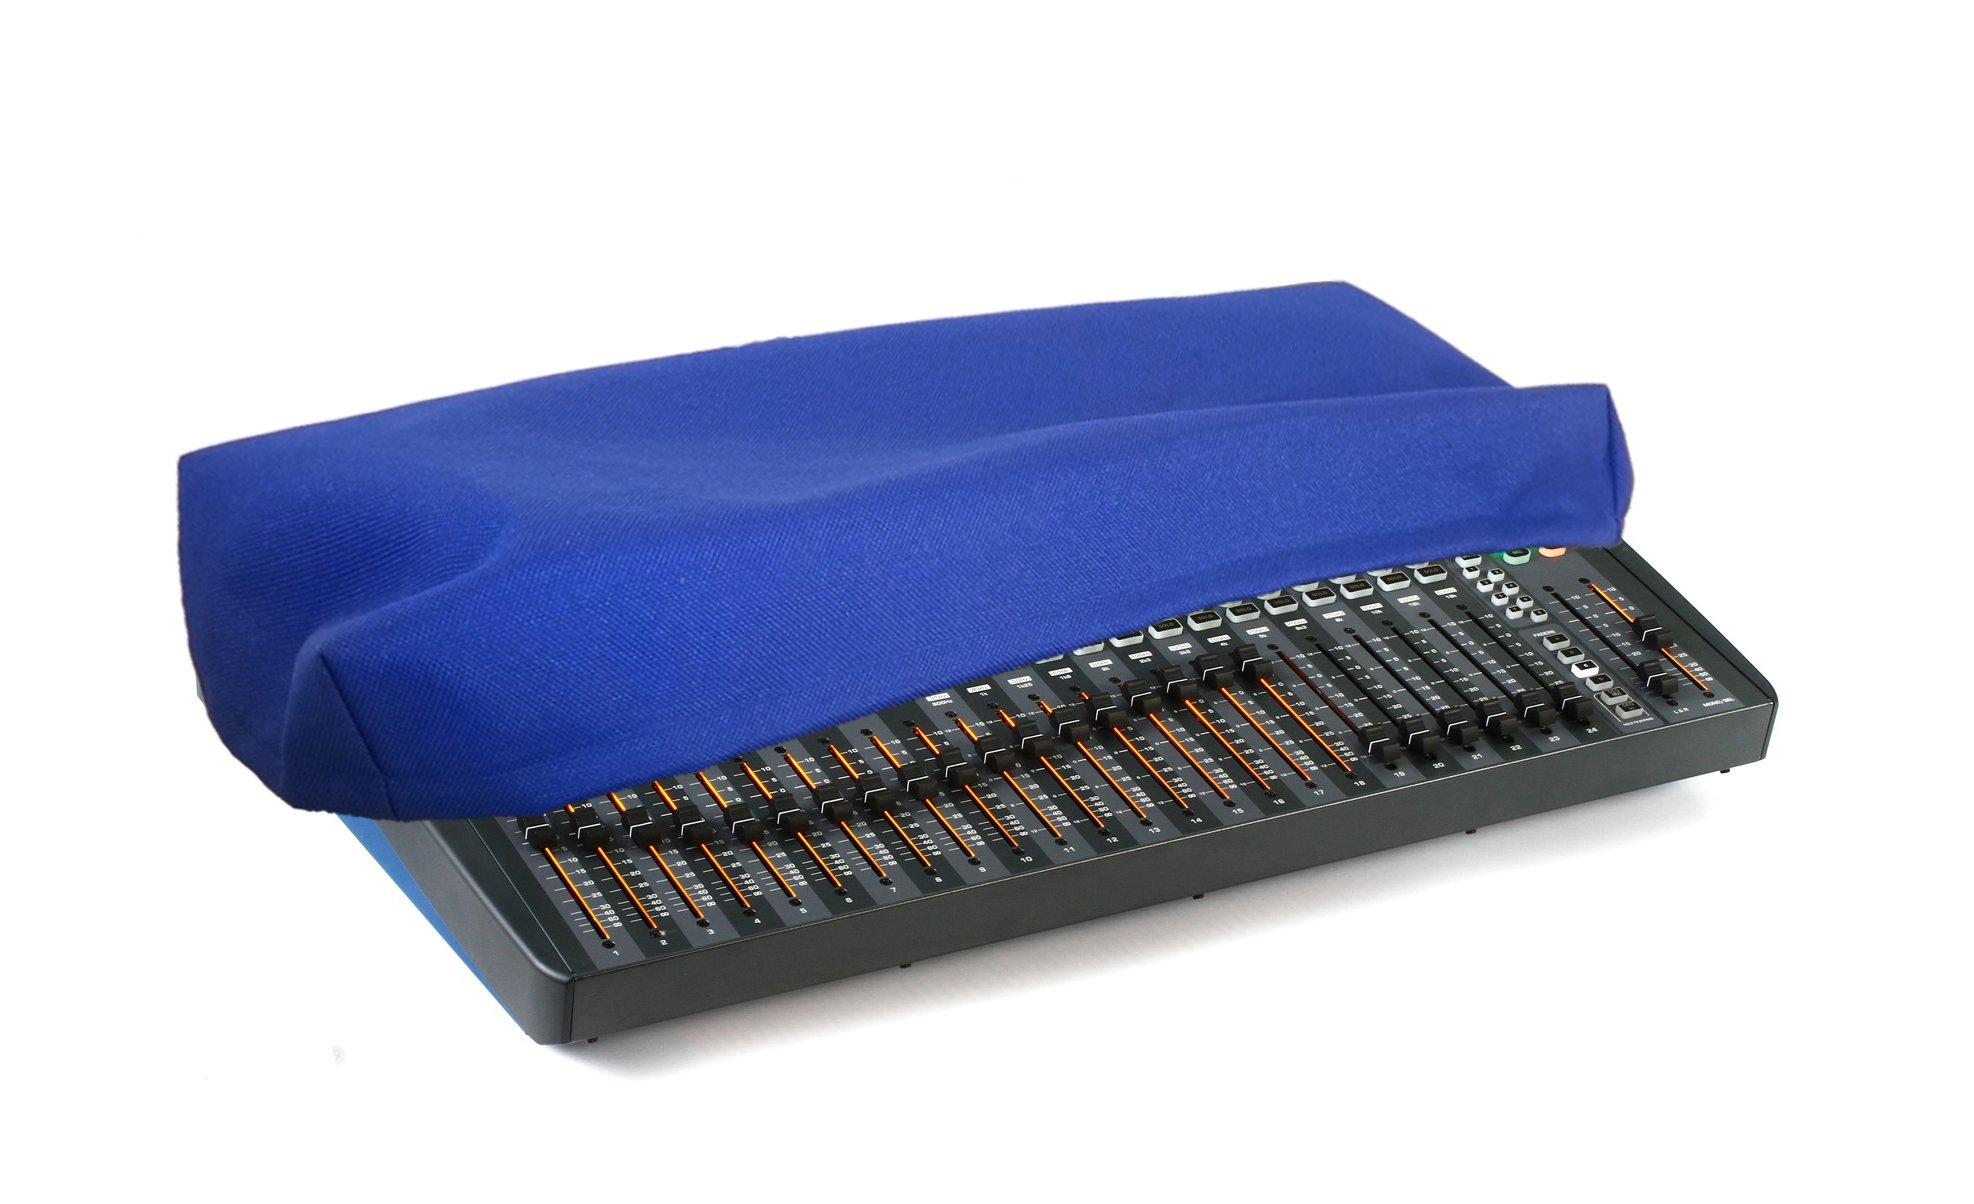 SOUNDCRAFT Si IMPACT/IMPACT 2 Audio Mixer Recording Studio Console Protective Dust Cover [Blue Nylon; Water Resistant; Antistatic; Premium Fabric] by DigitalDeckCovers